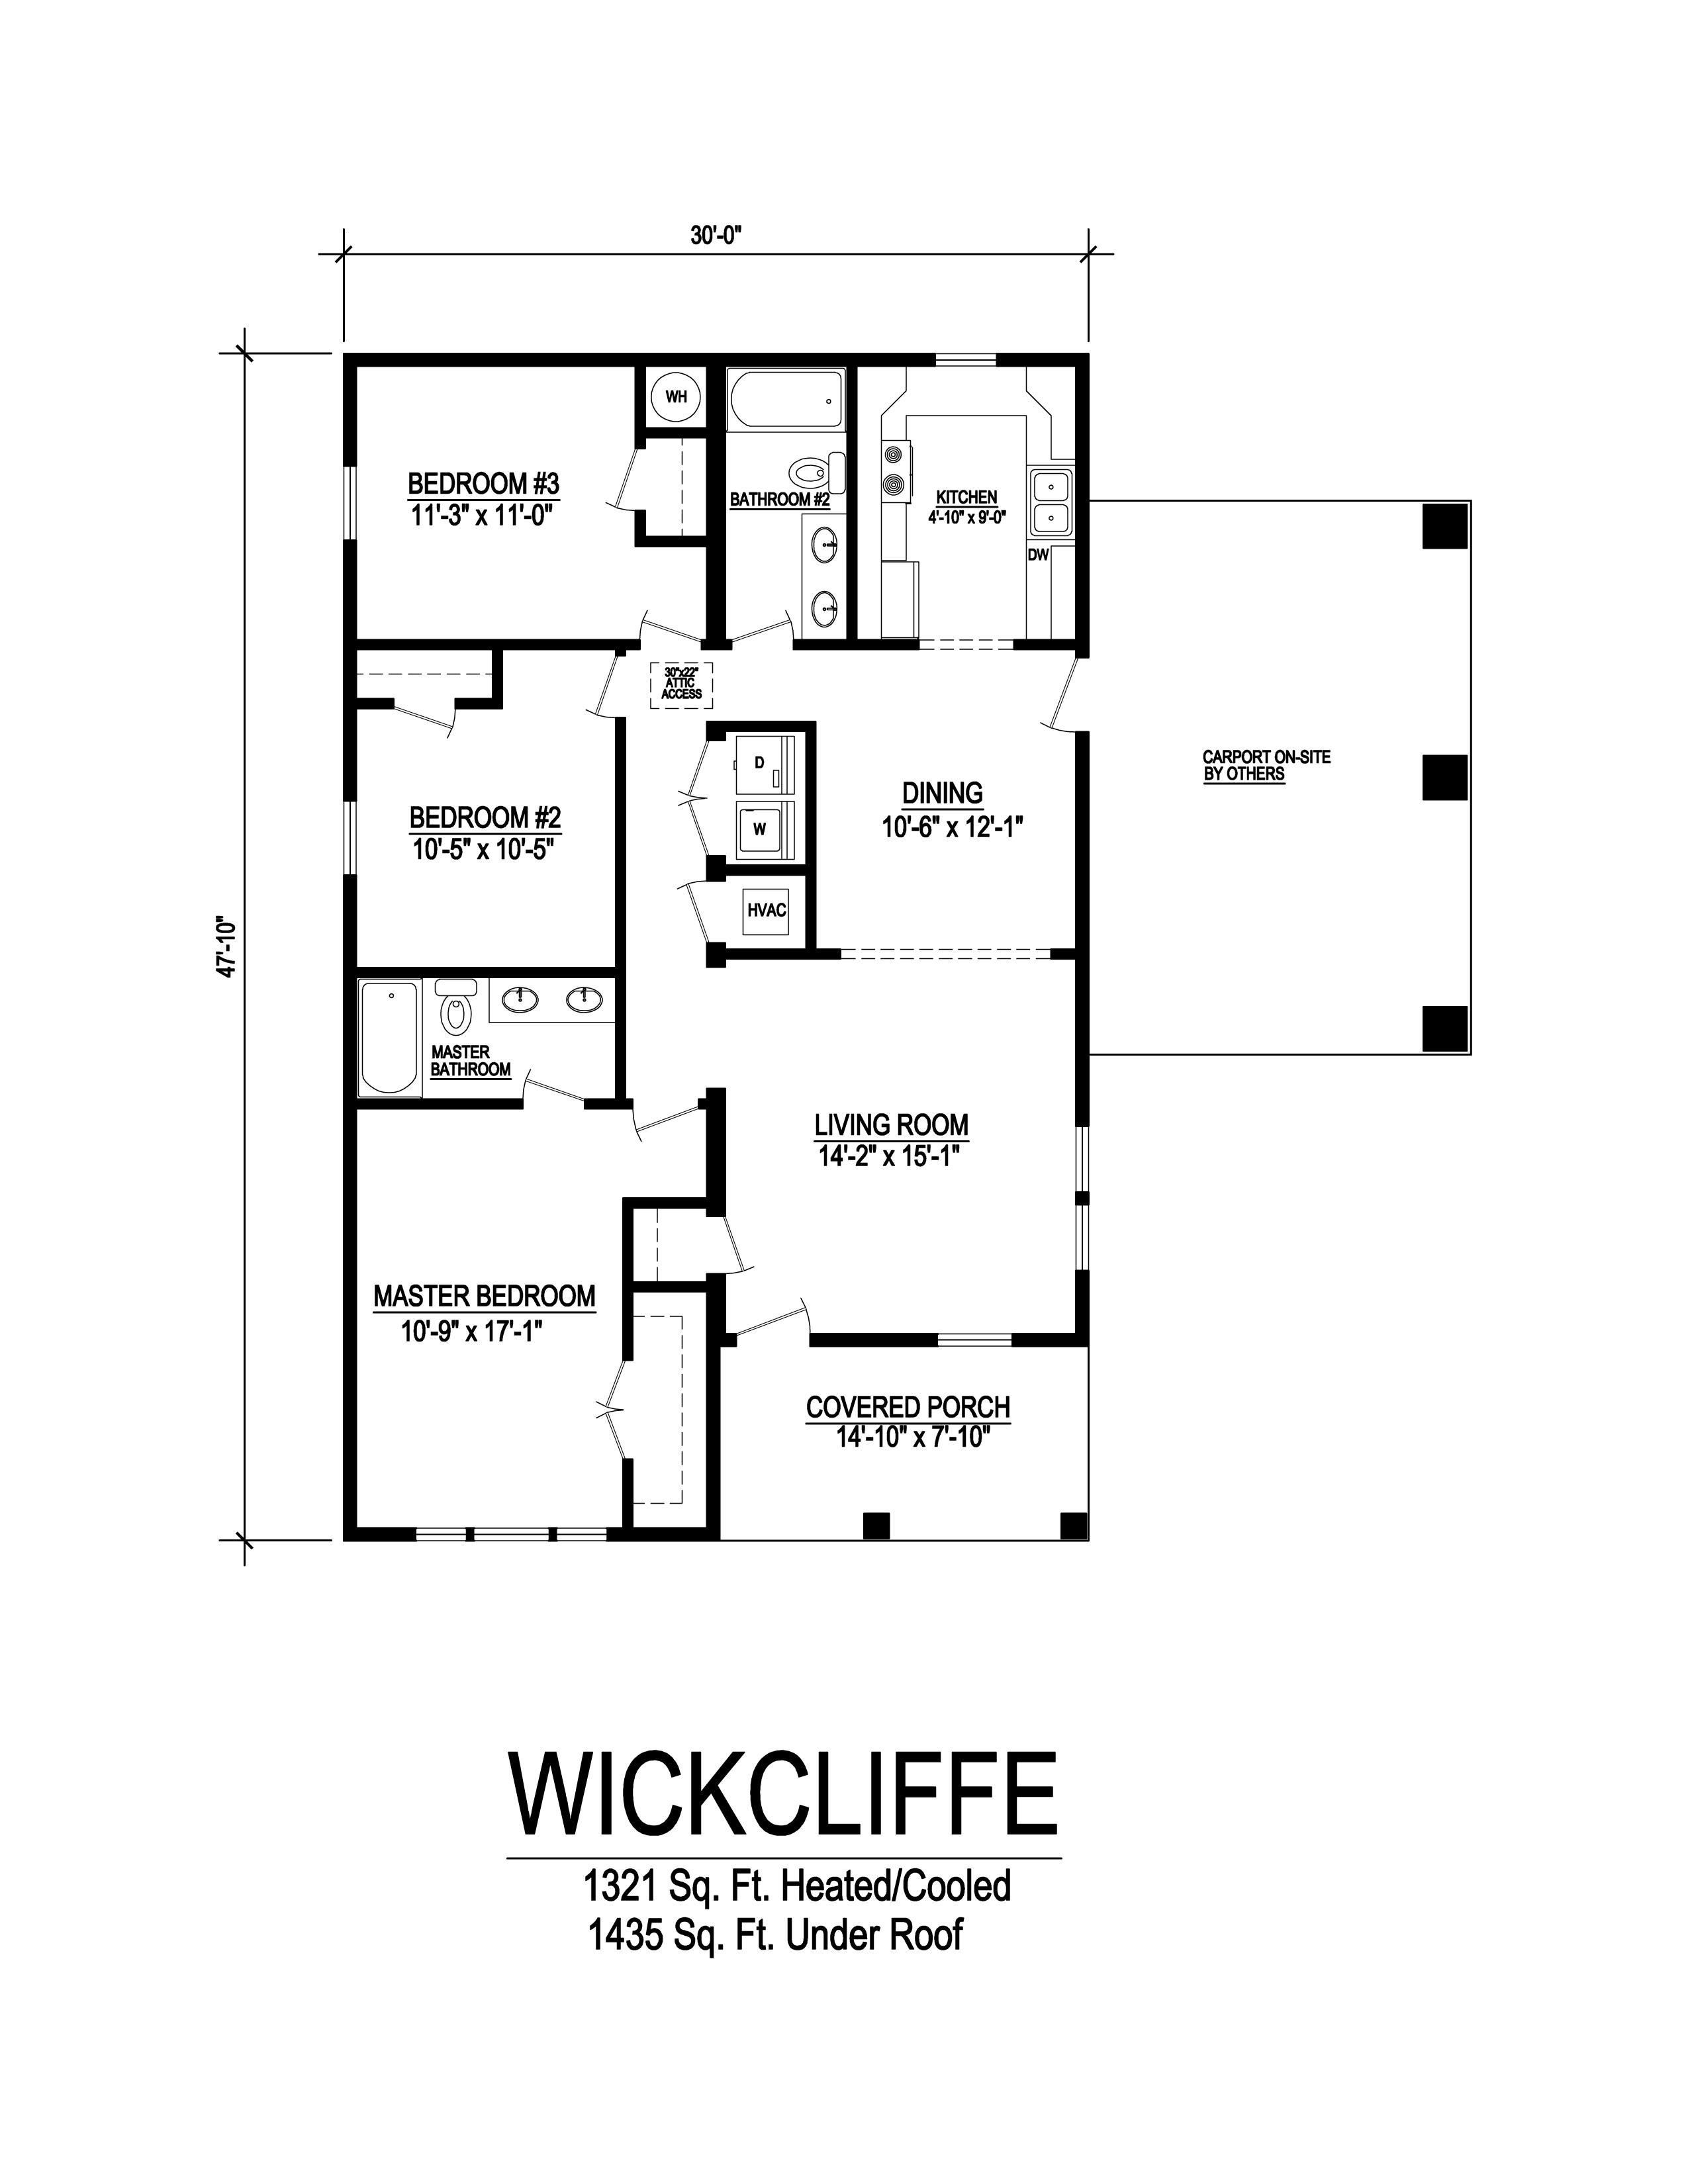 wickliffe modular home floorplan